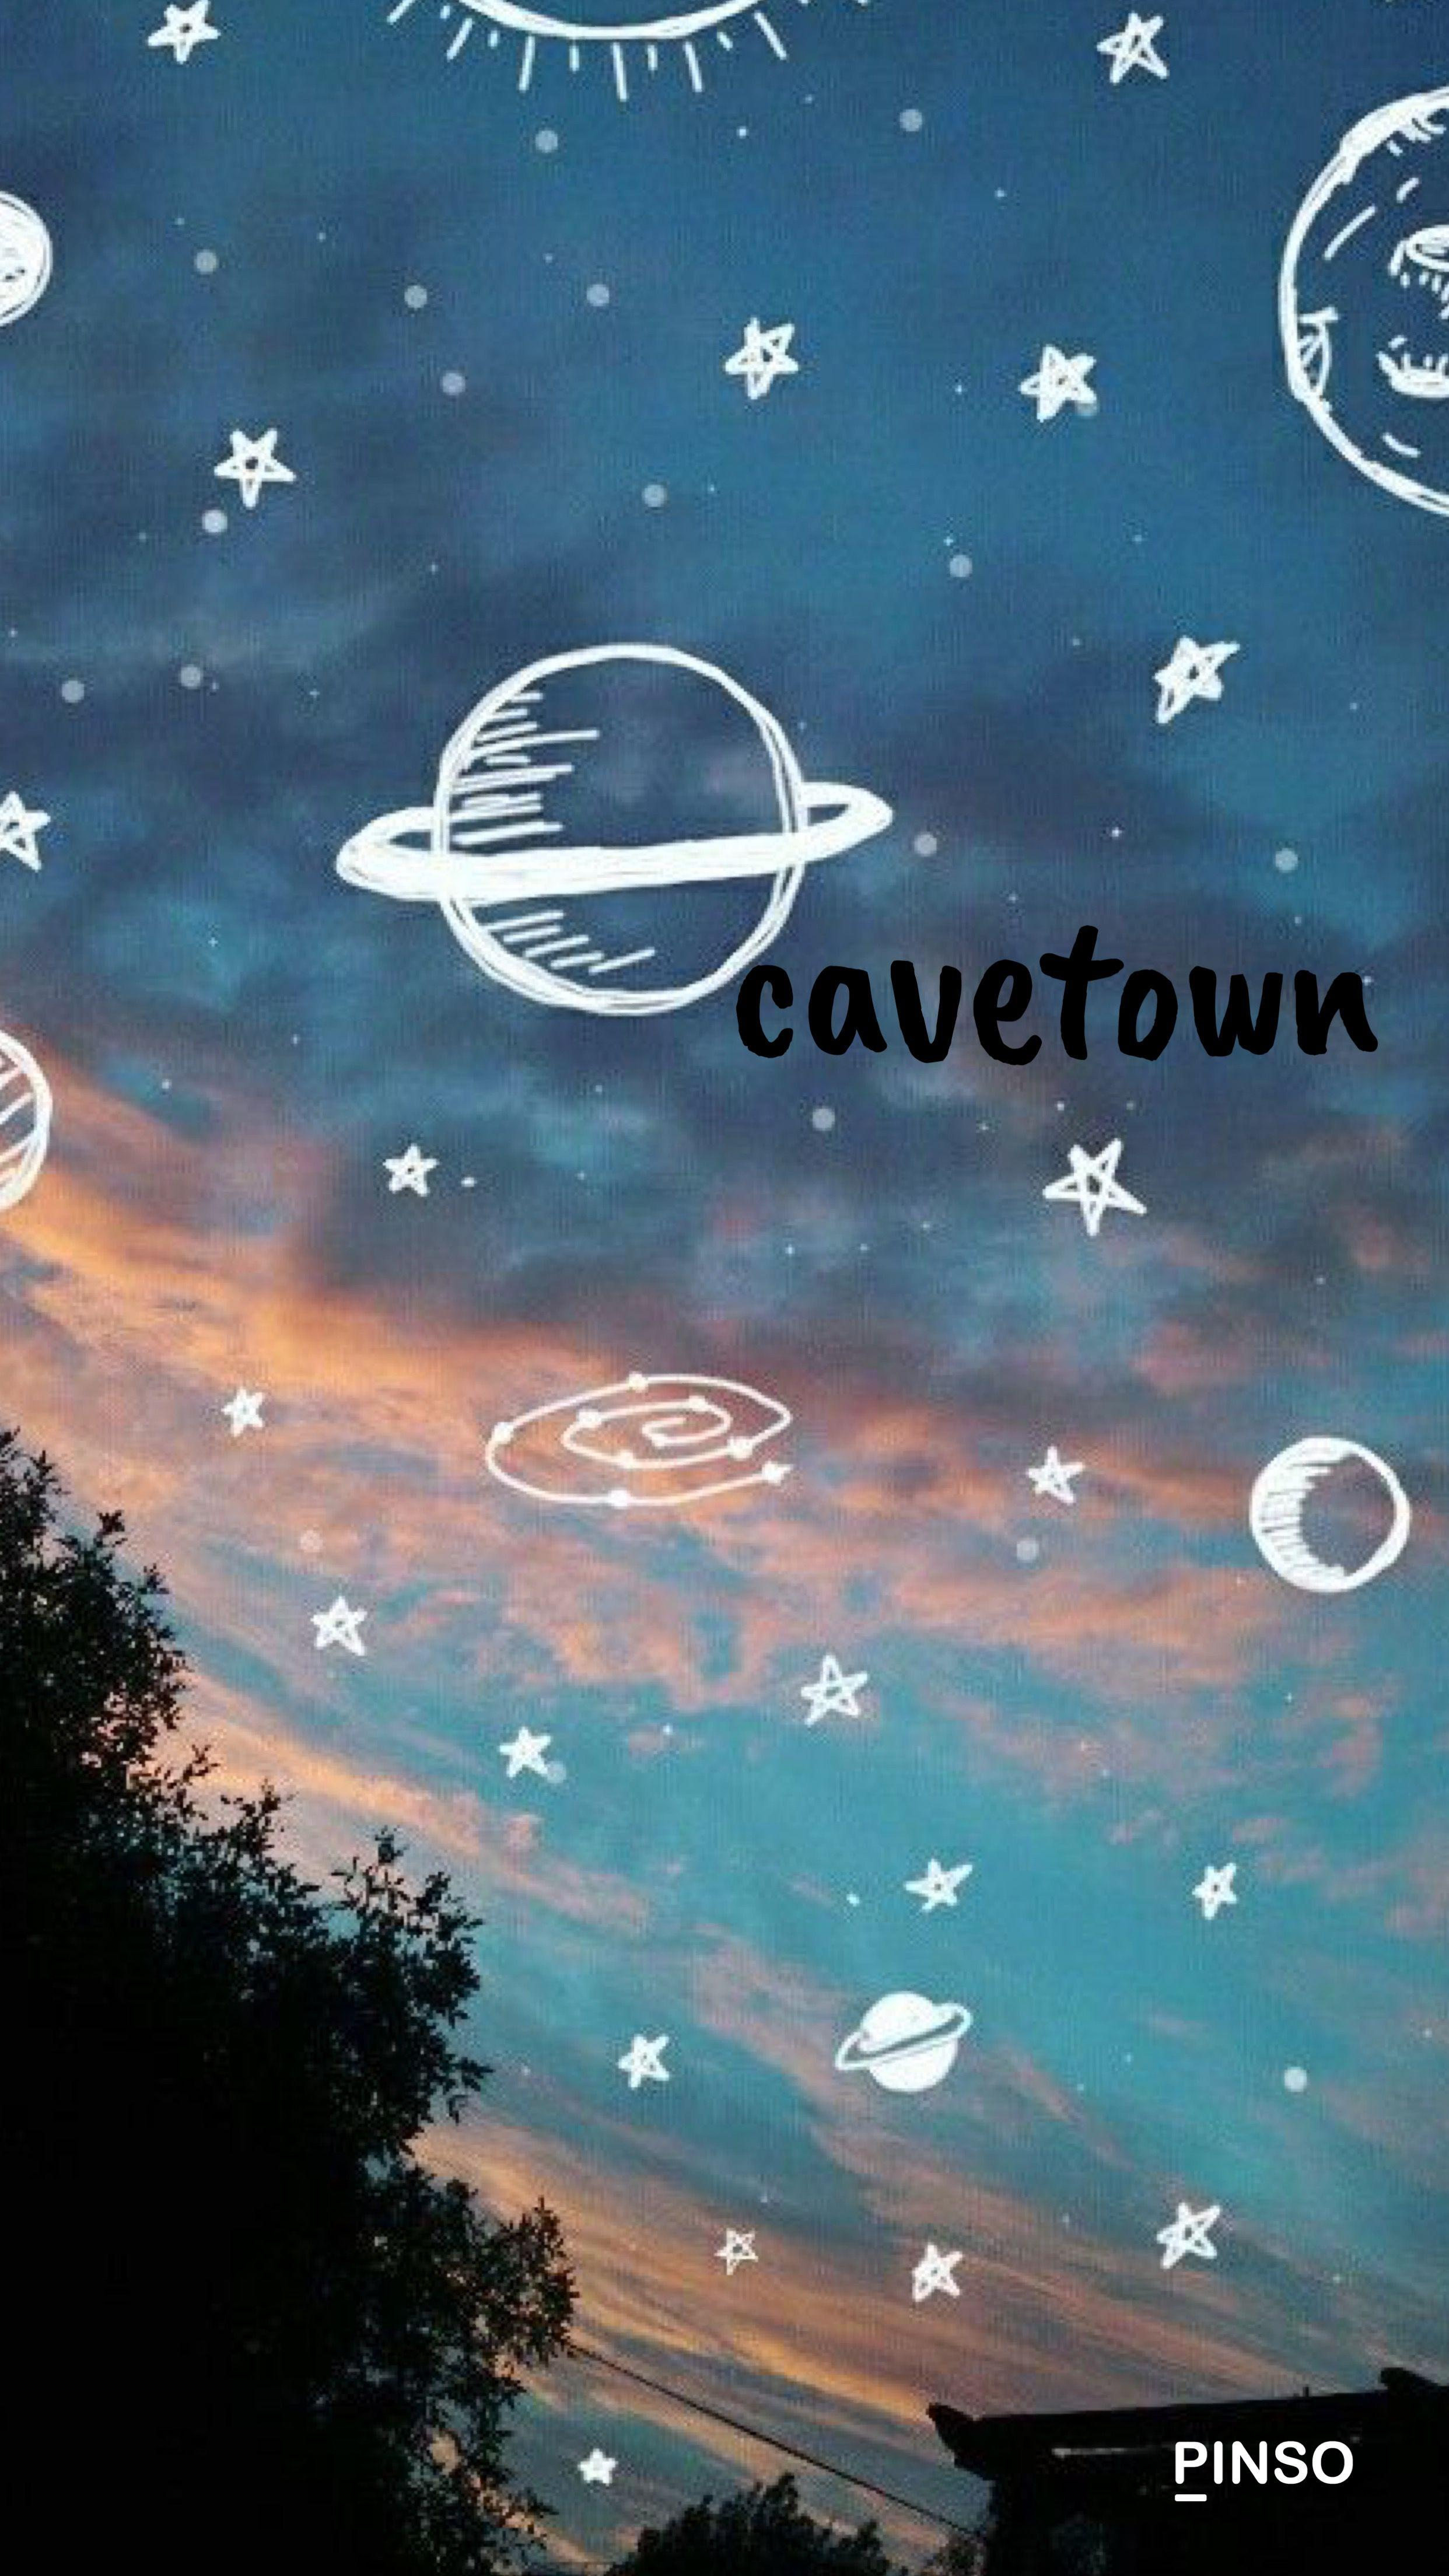 Cavetown Wallpapers Top Free Cavetown Backgrounds Wallpaperaccess